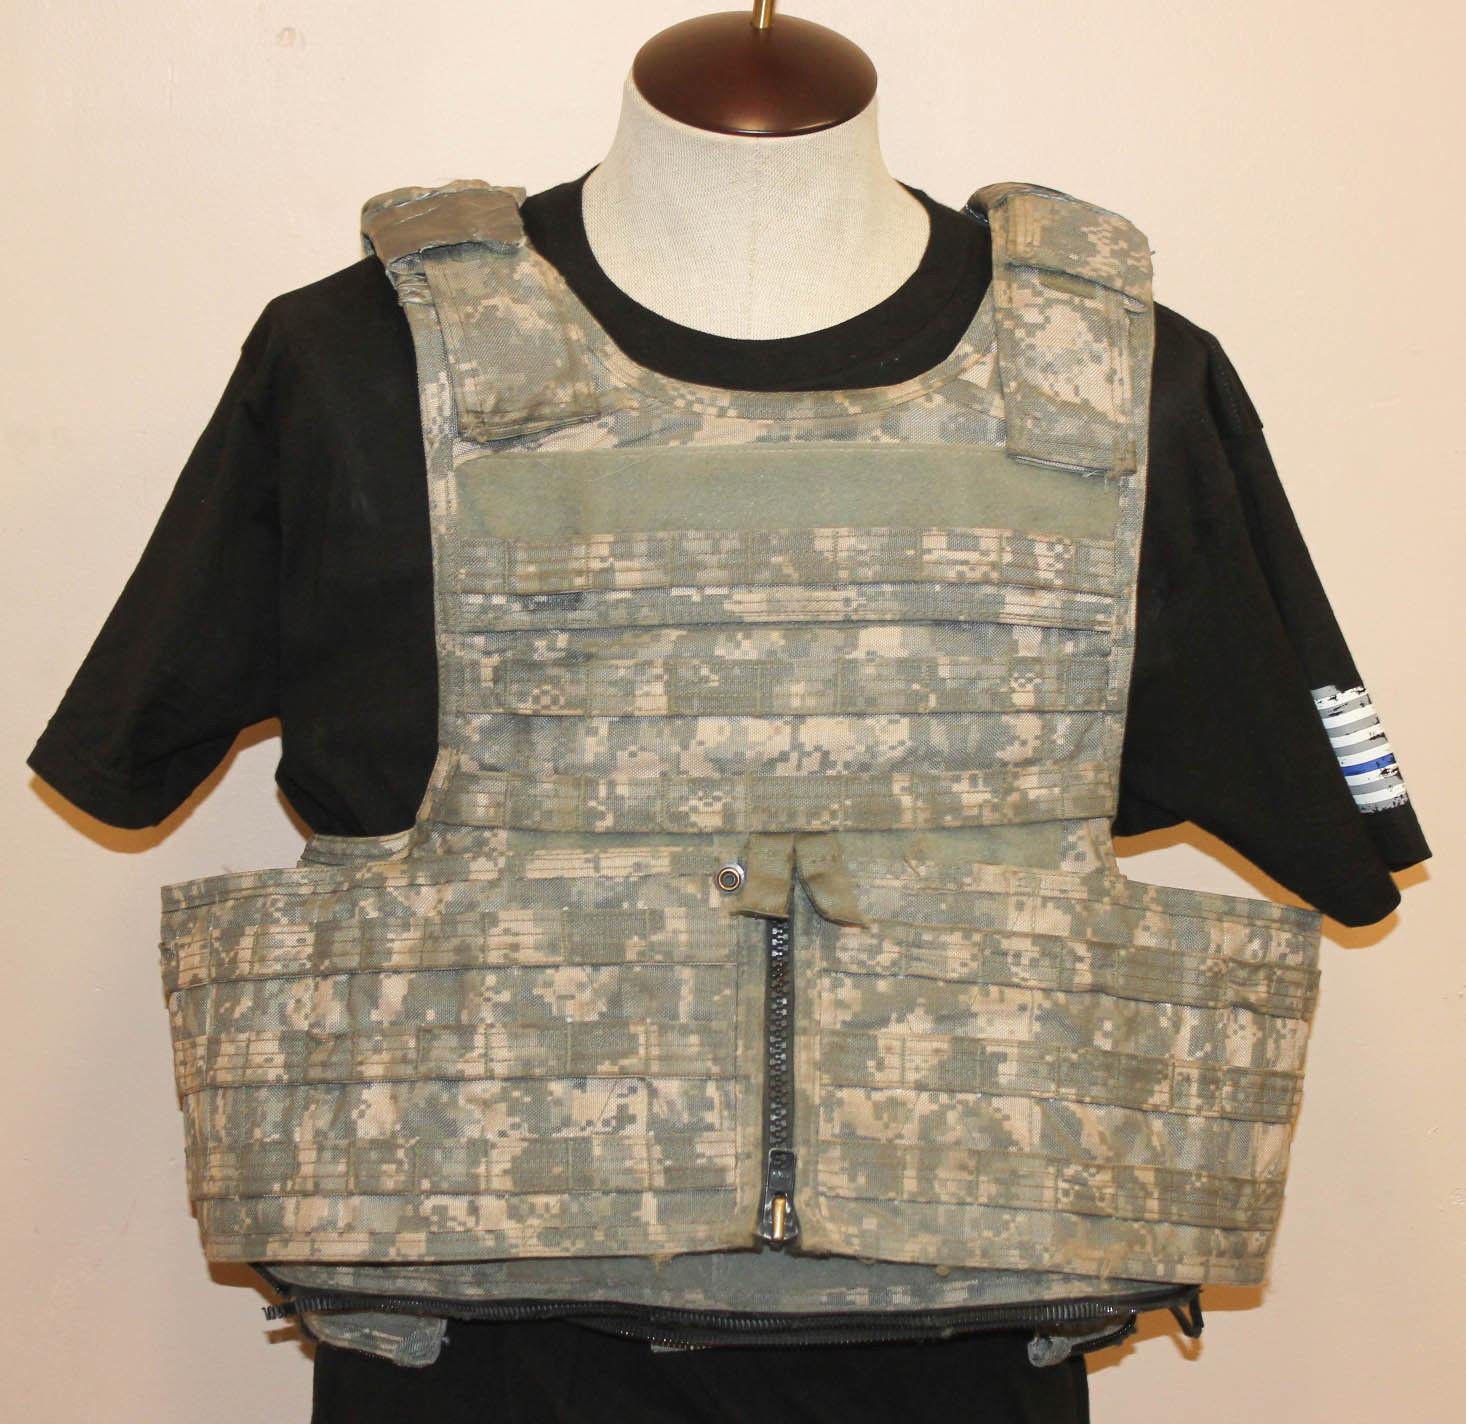 Details about Medium MSA Paraclete RAV MTV Plate Carrier Body Armor Vest ACU Digital Camo 6